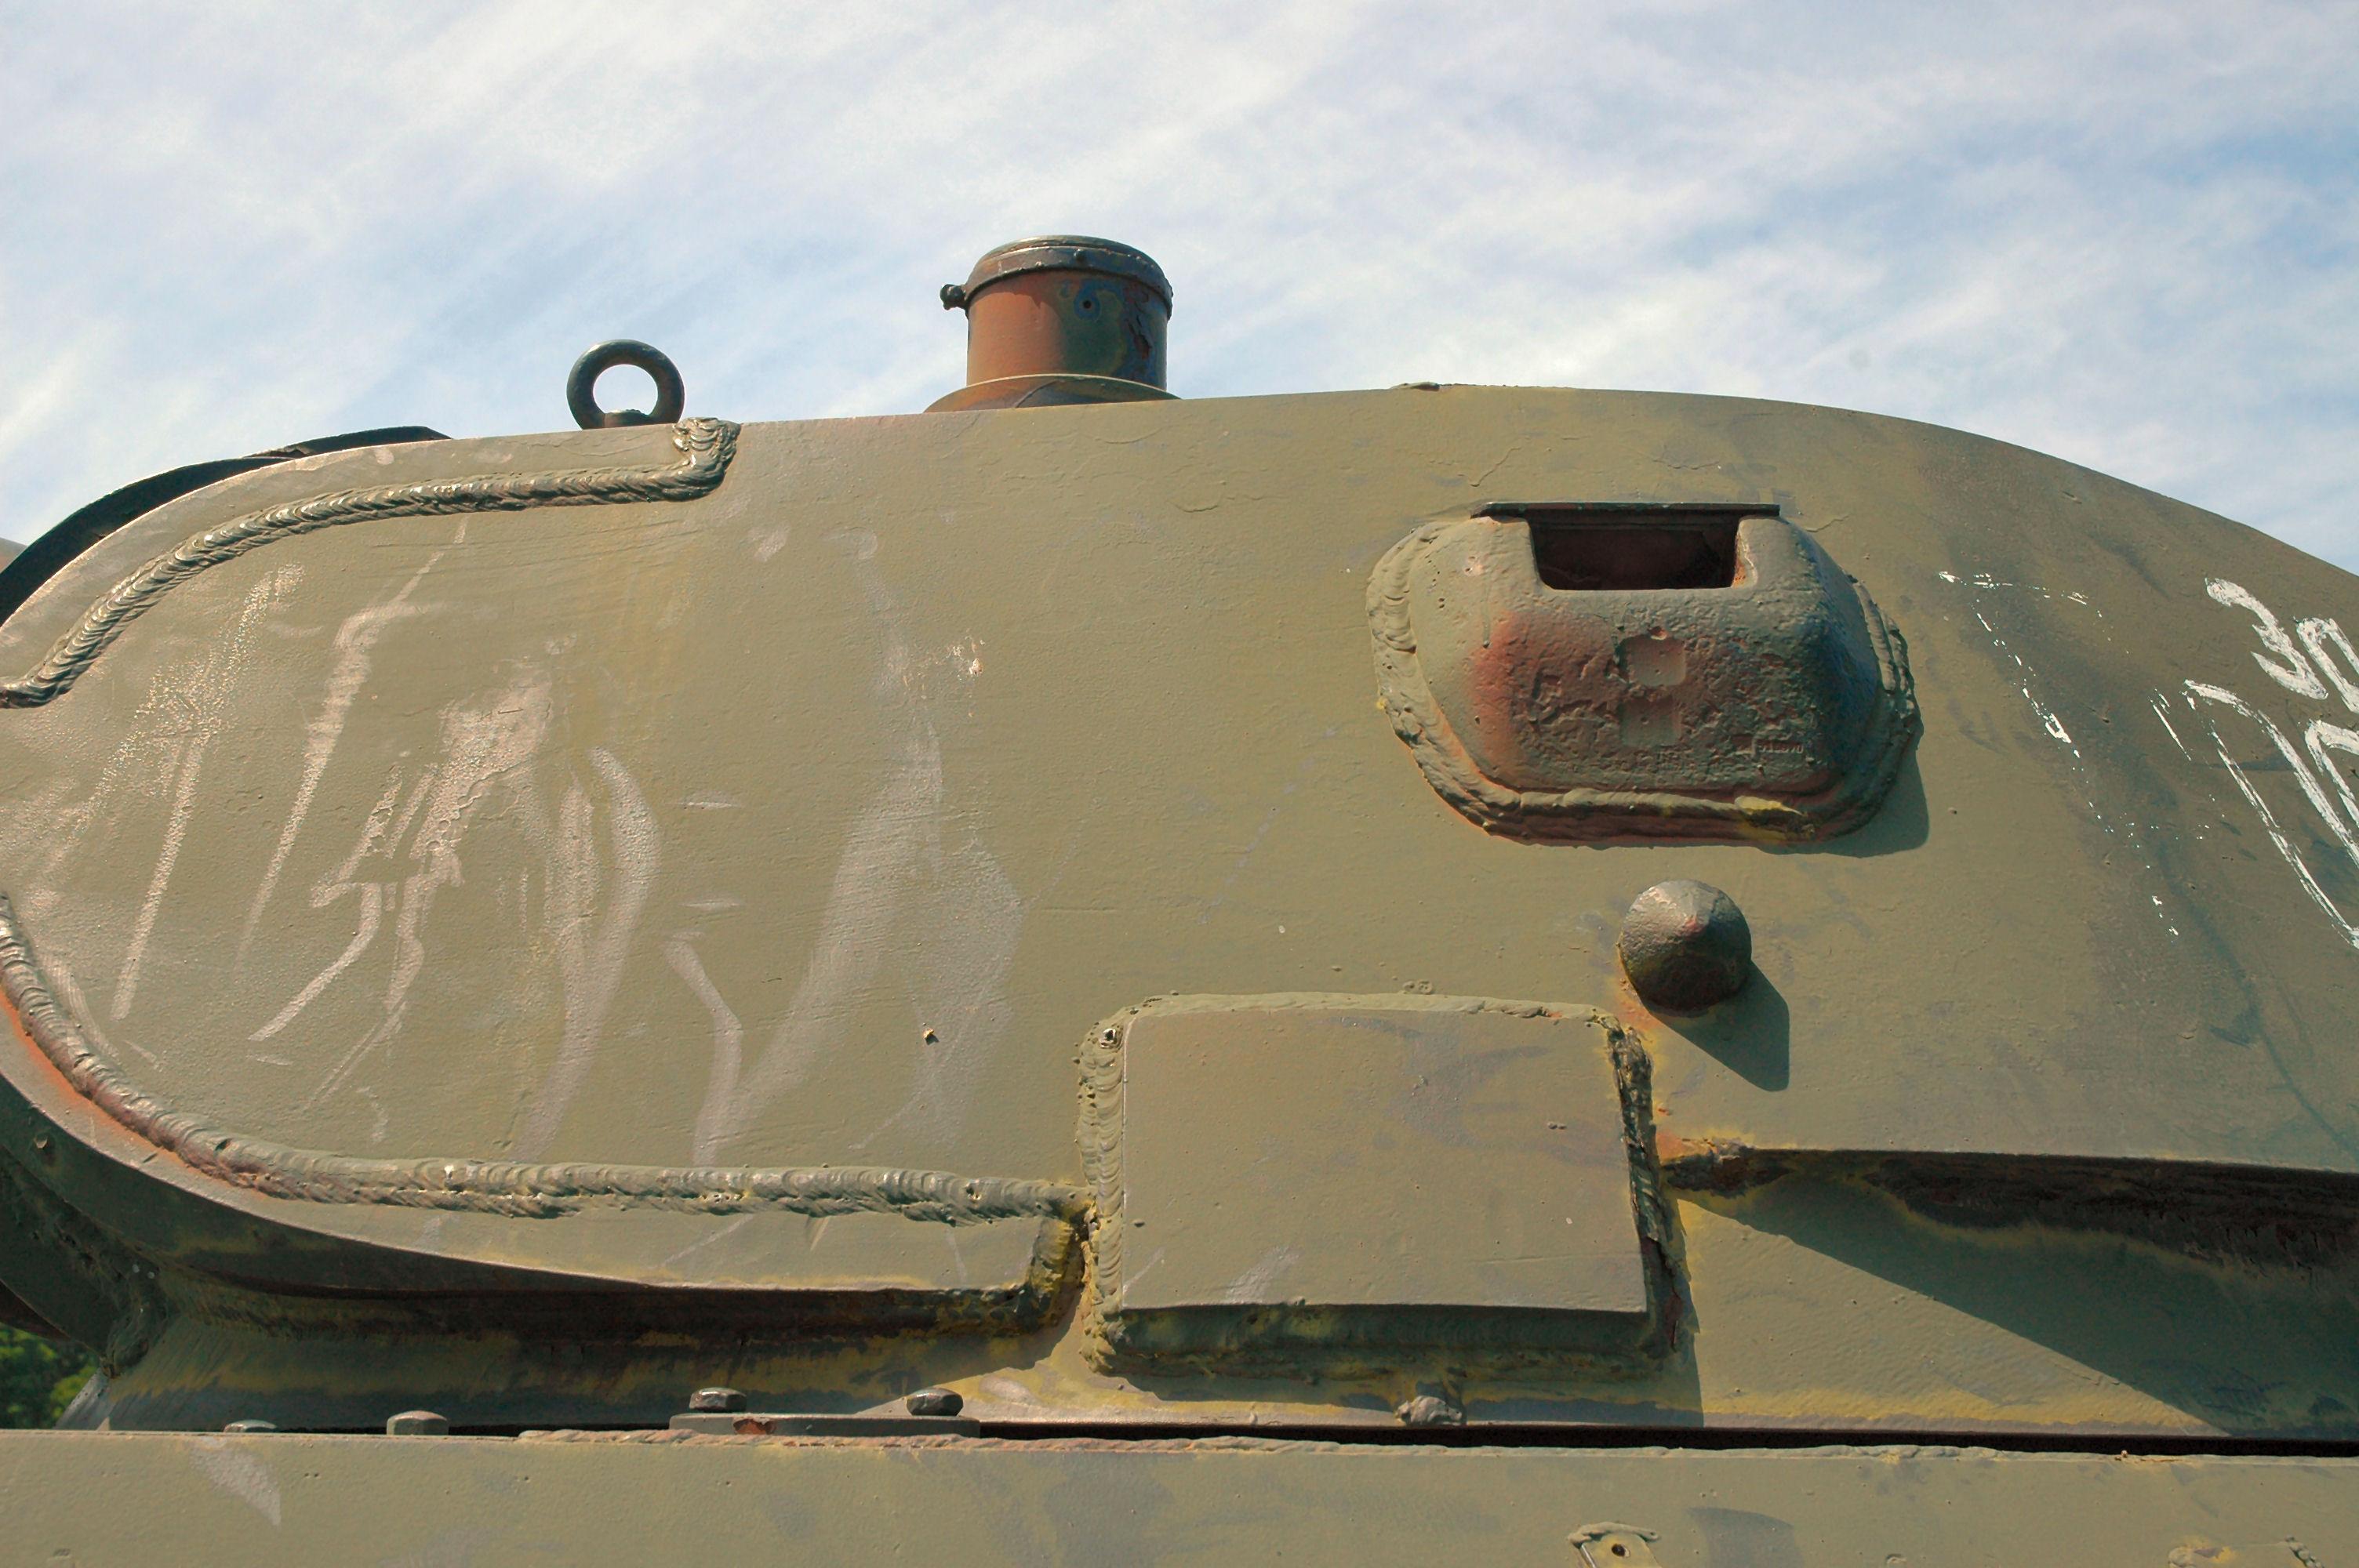 t-34_76_1941_005_of_158.jpg